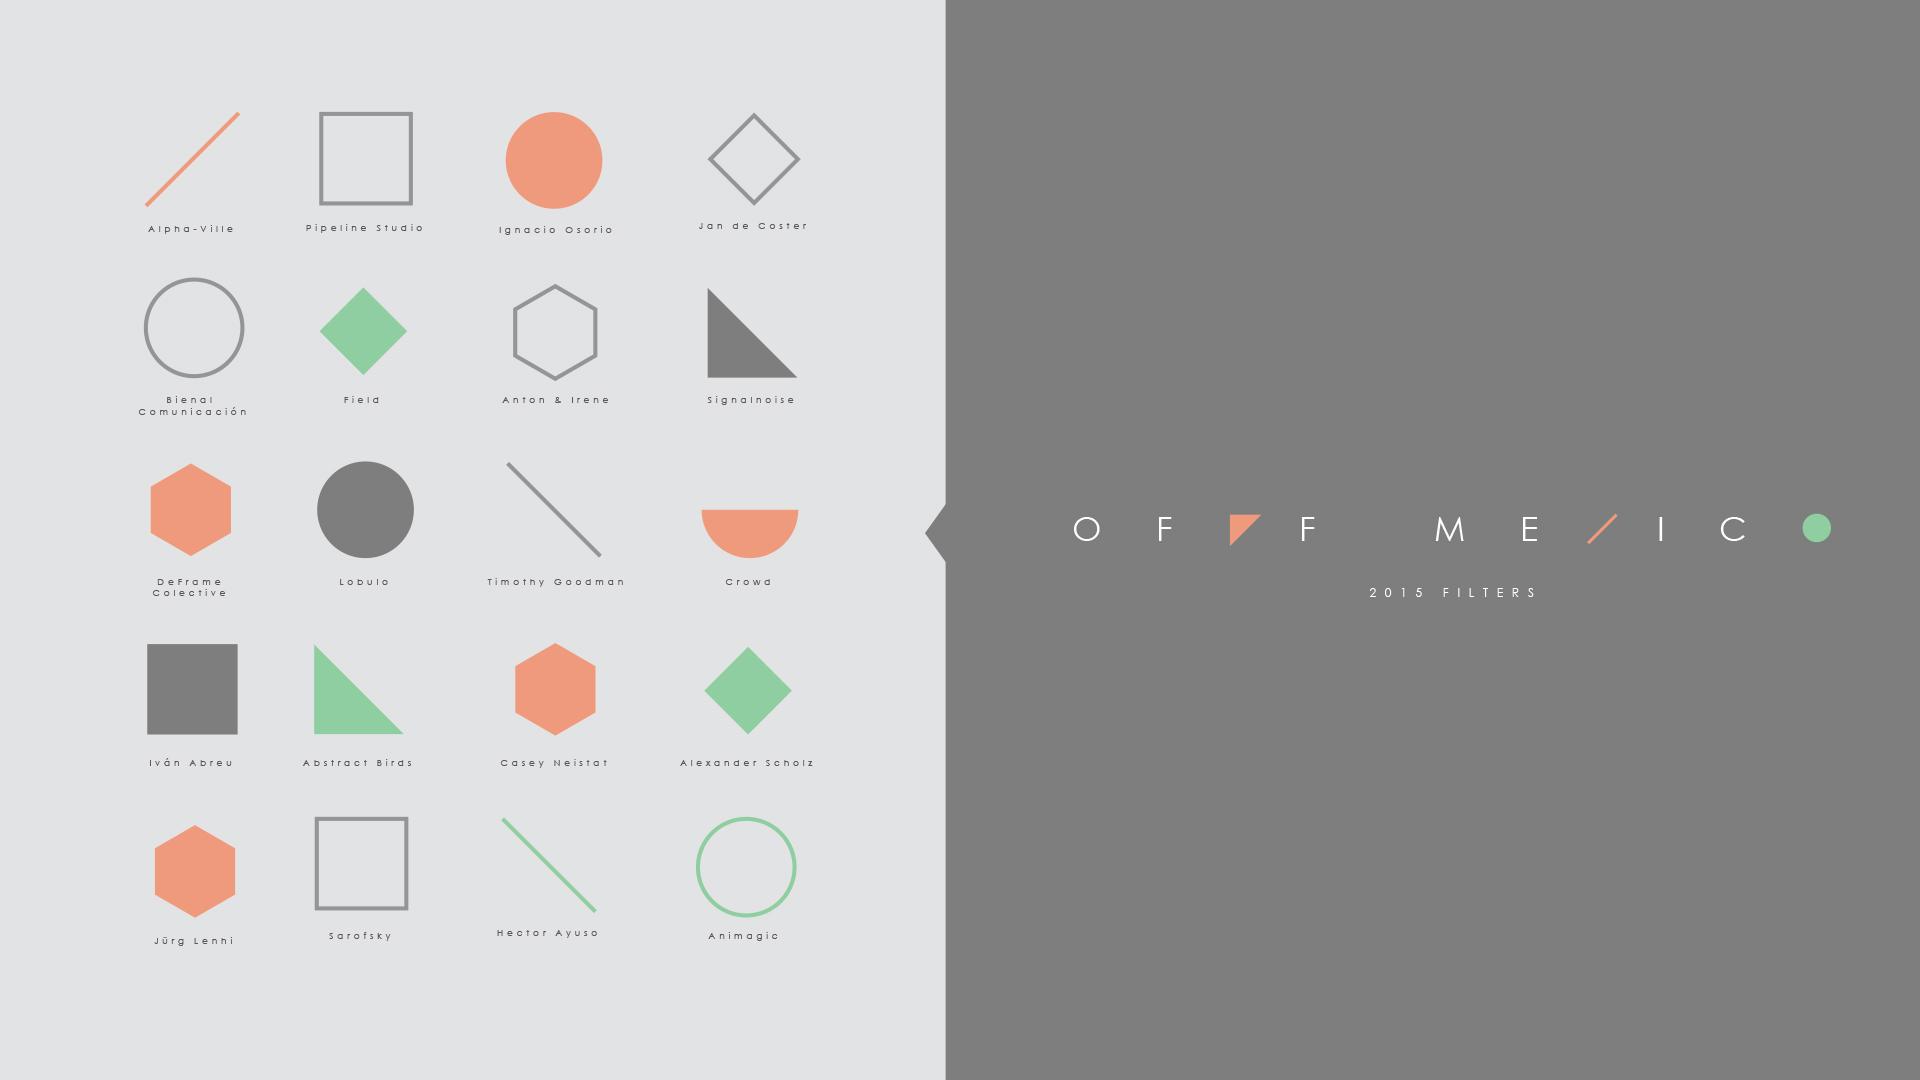 OFFFMexico_Interface_Exploration_v003.jpg